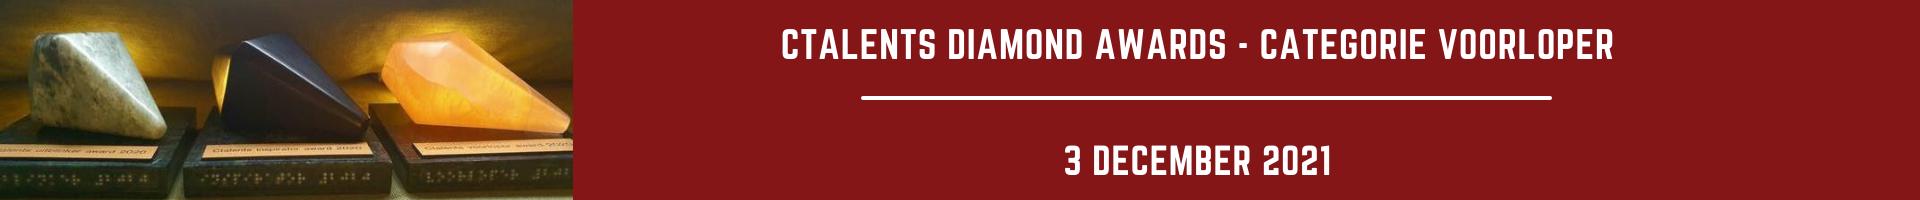 Ctalents Diamond Awards-1